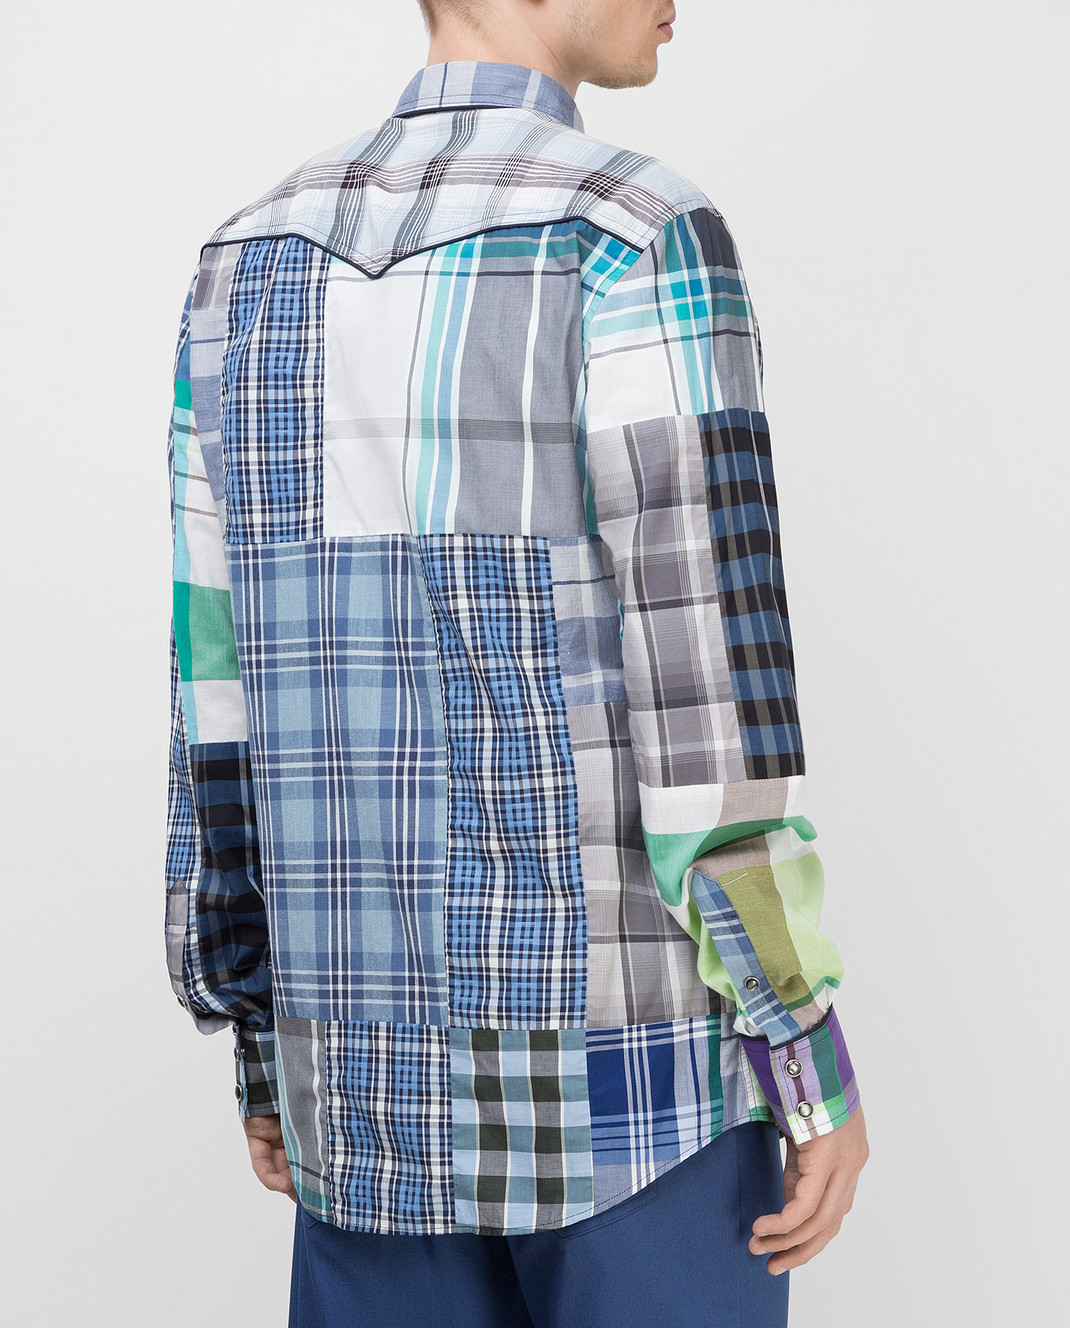 Dolce&Gabbana Синяя рубашка G5CS8TG9Y16 изображение 4